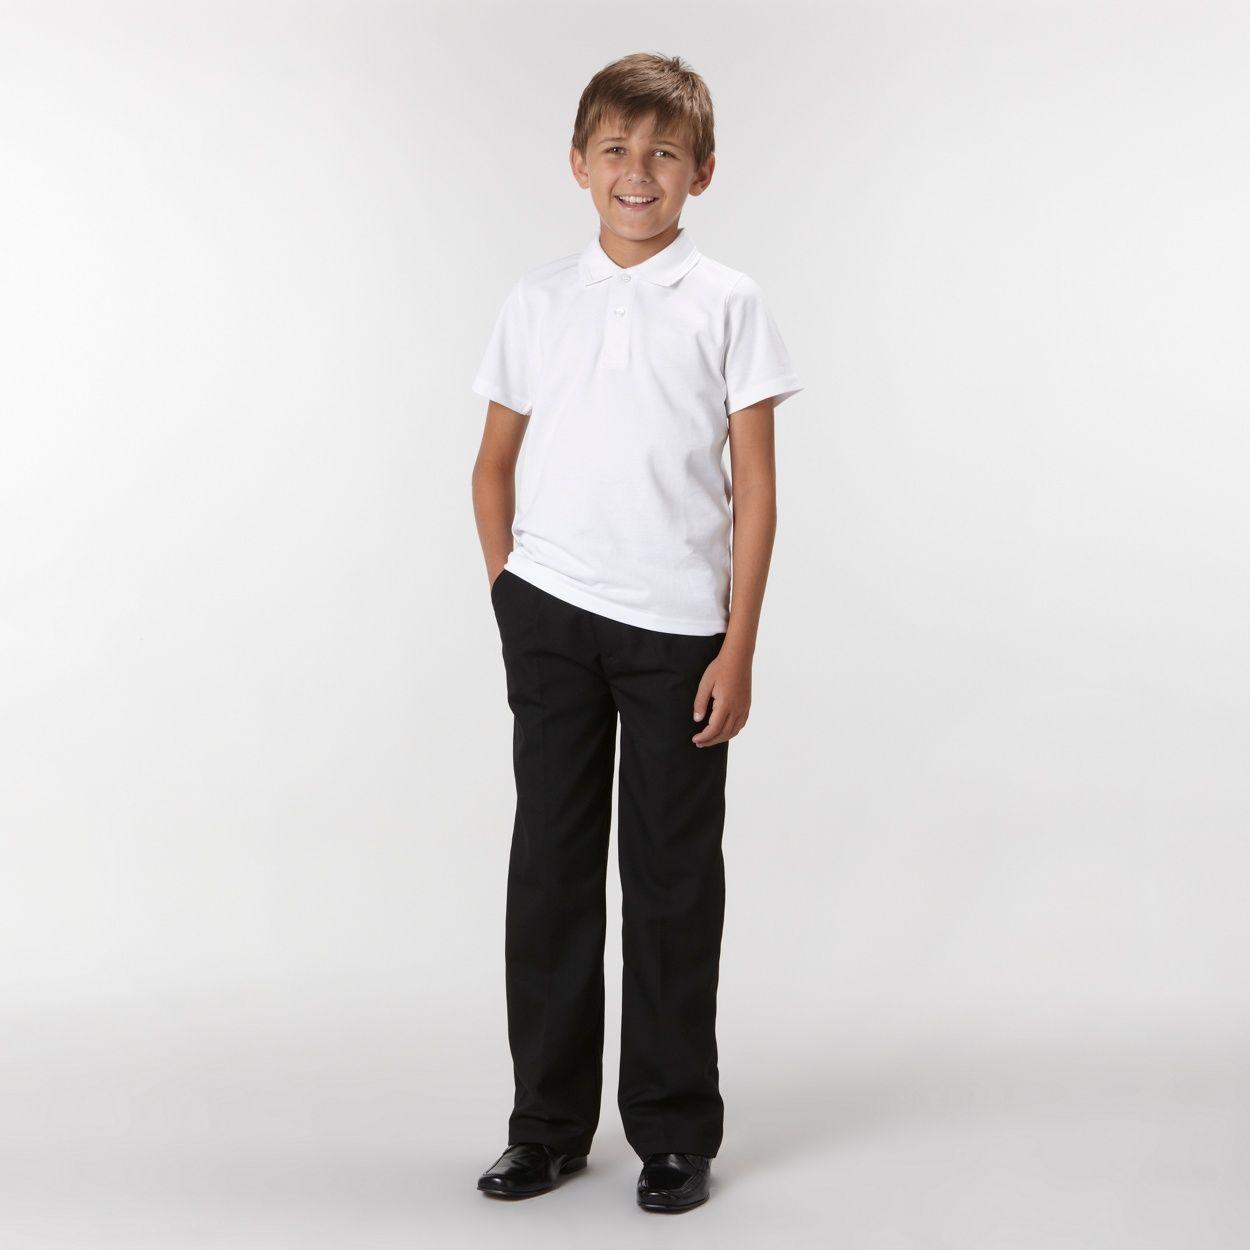 Debenhams Boy's pack of two white school uniform polo shirts- at Debenhams.com